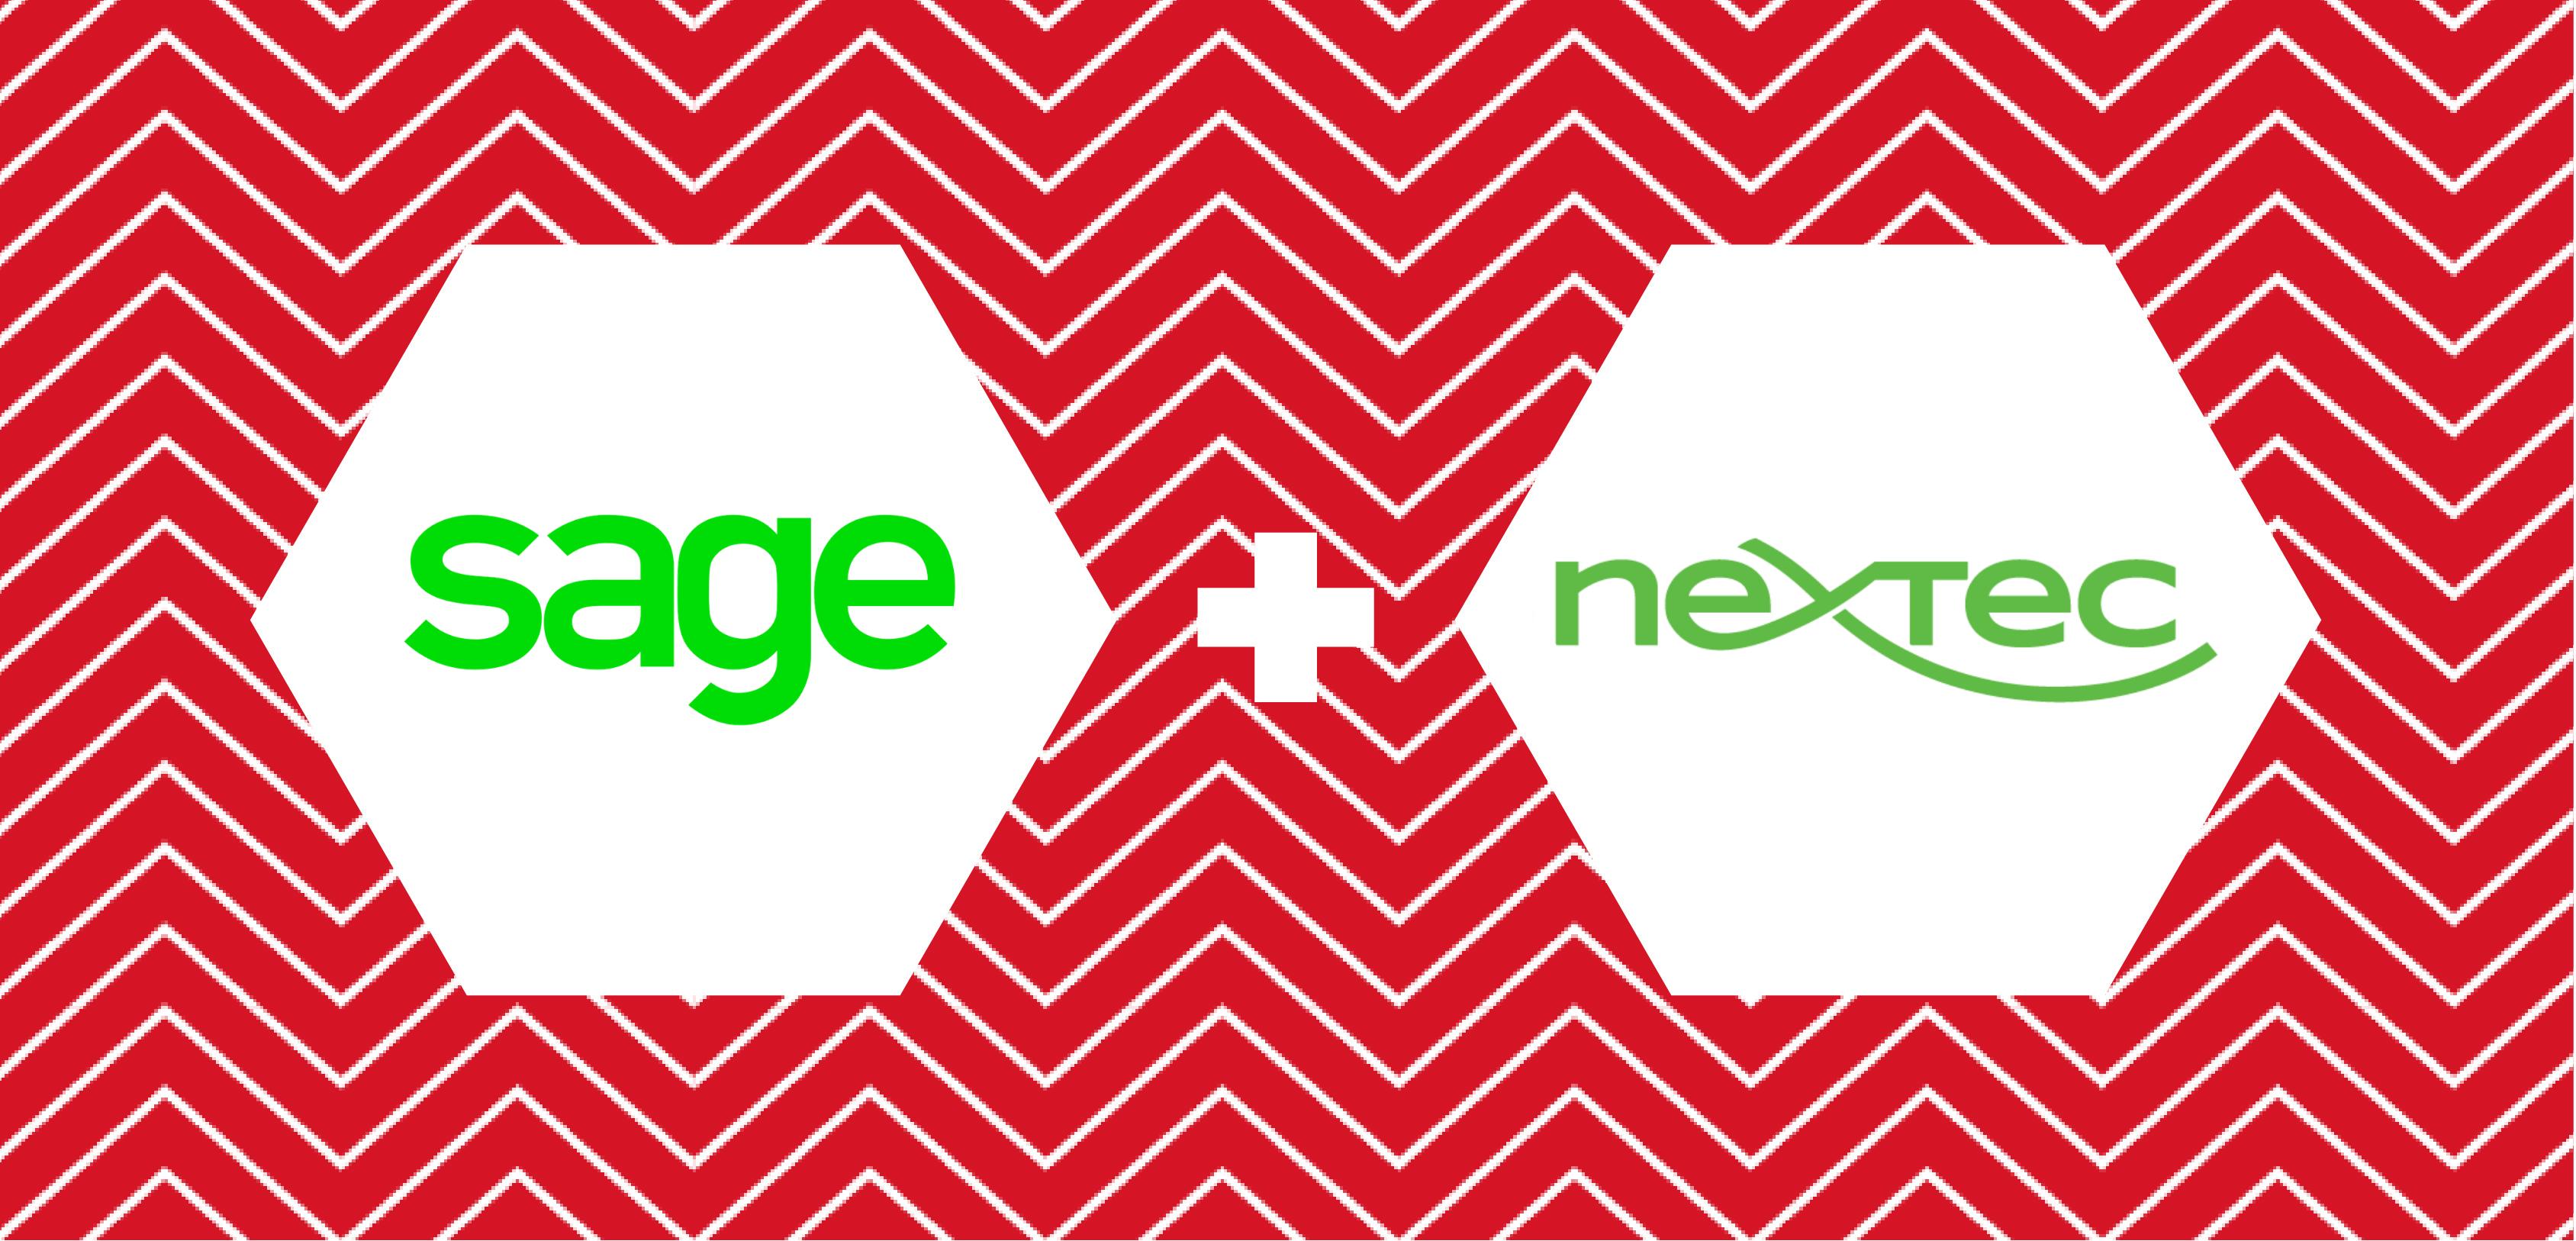 Sage and Nextec case study branding